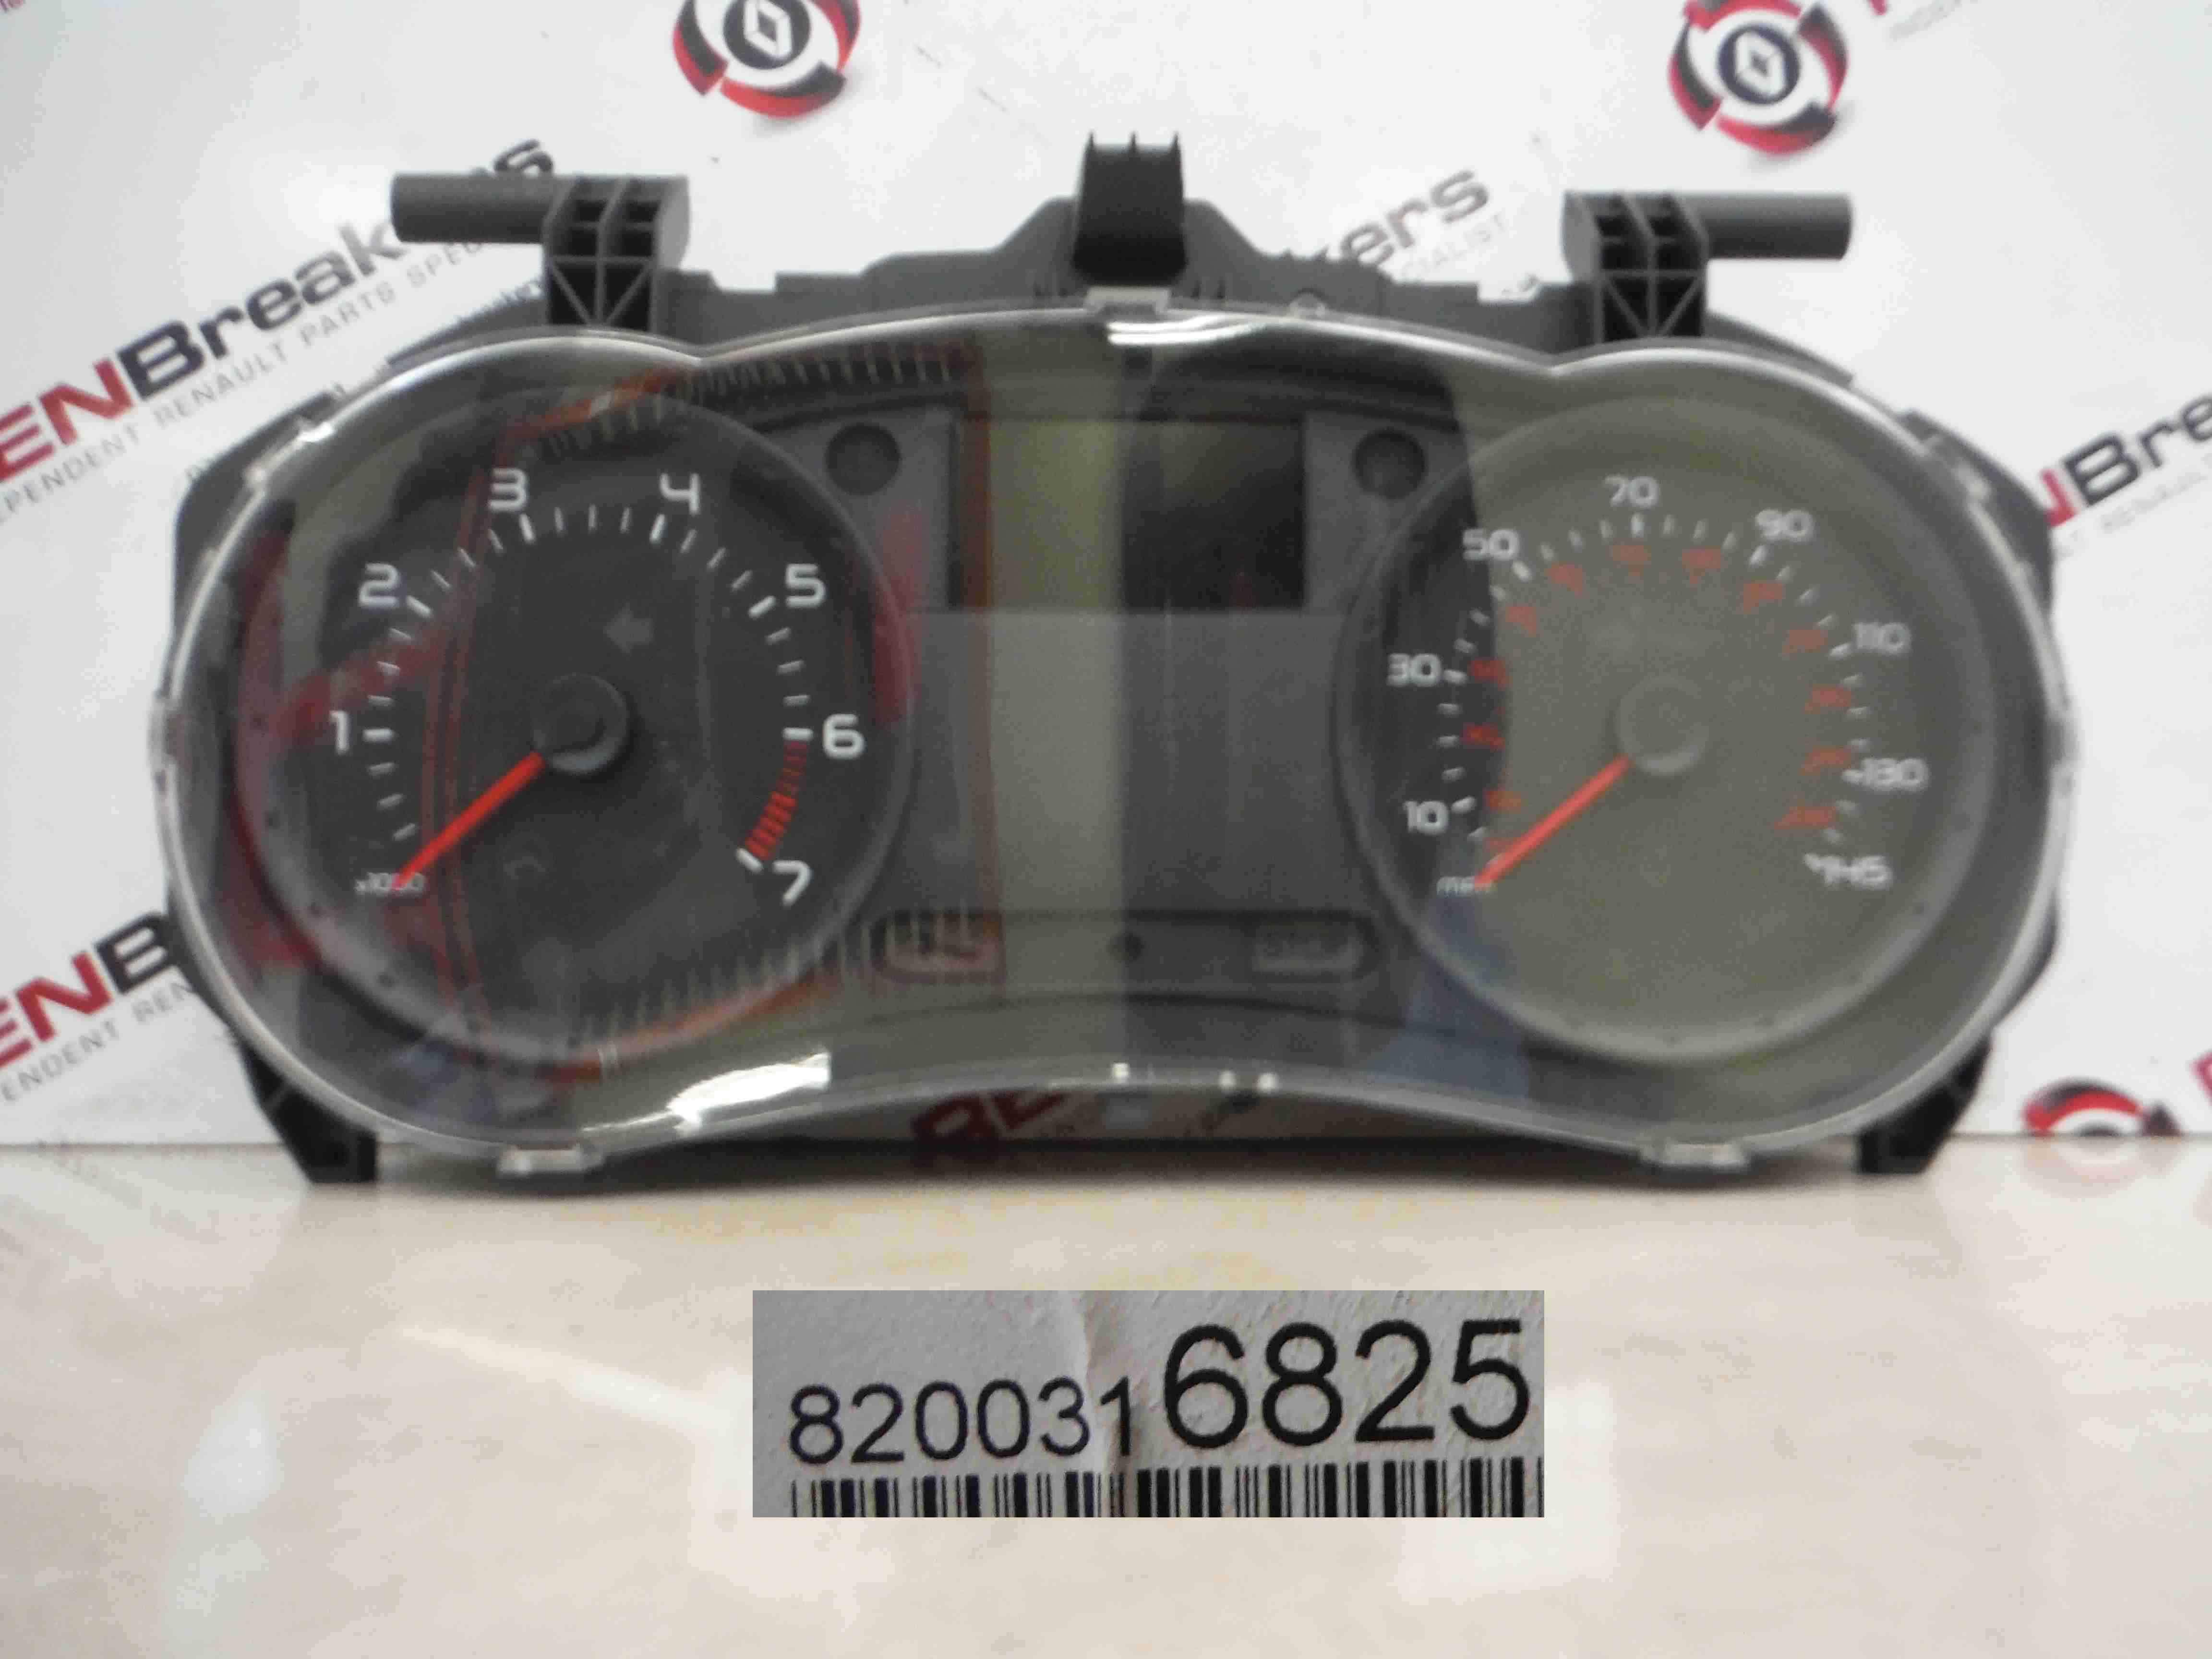 Renault Clio MK3 2005-2009 Instrument Panel Dials Clocks Gauges 51k 8200316825